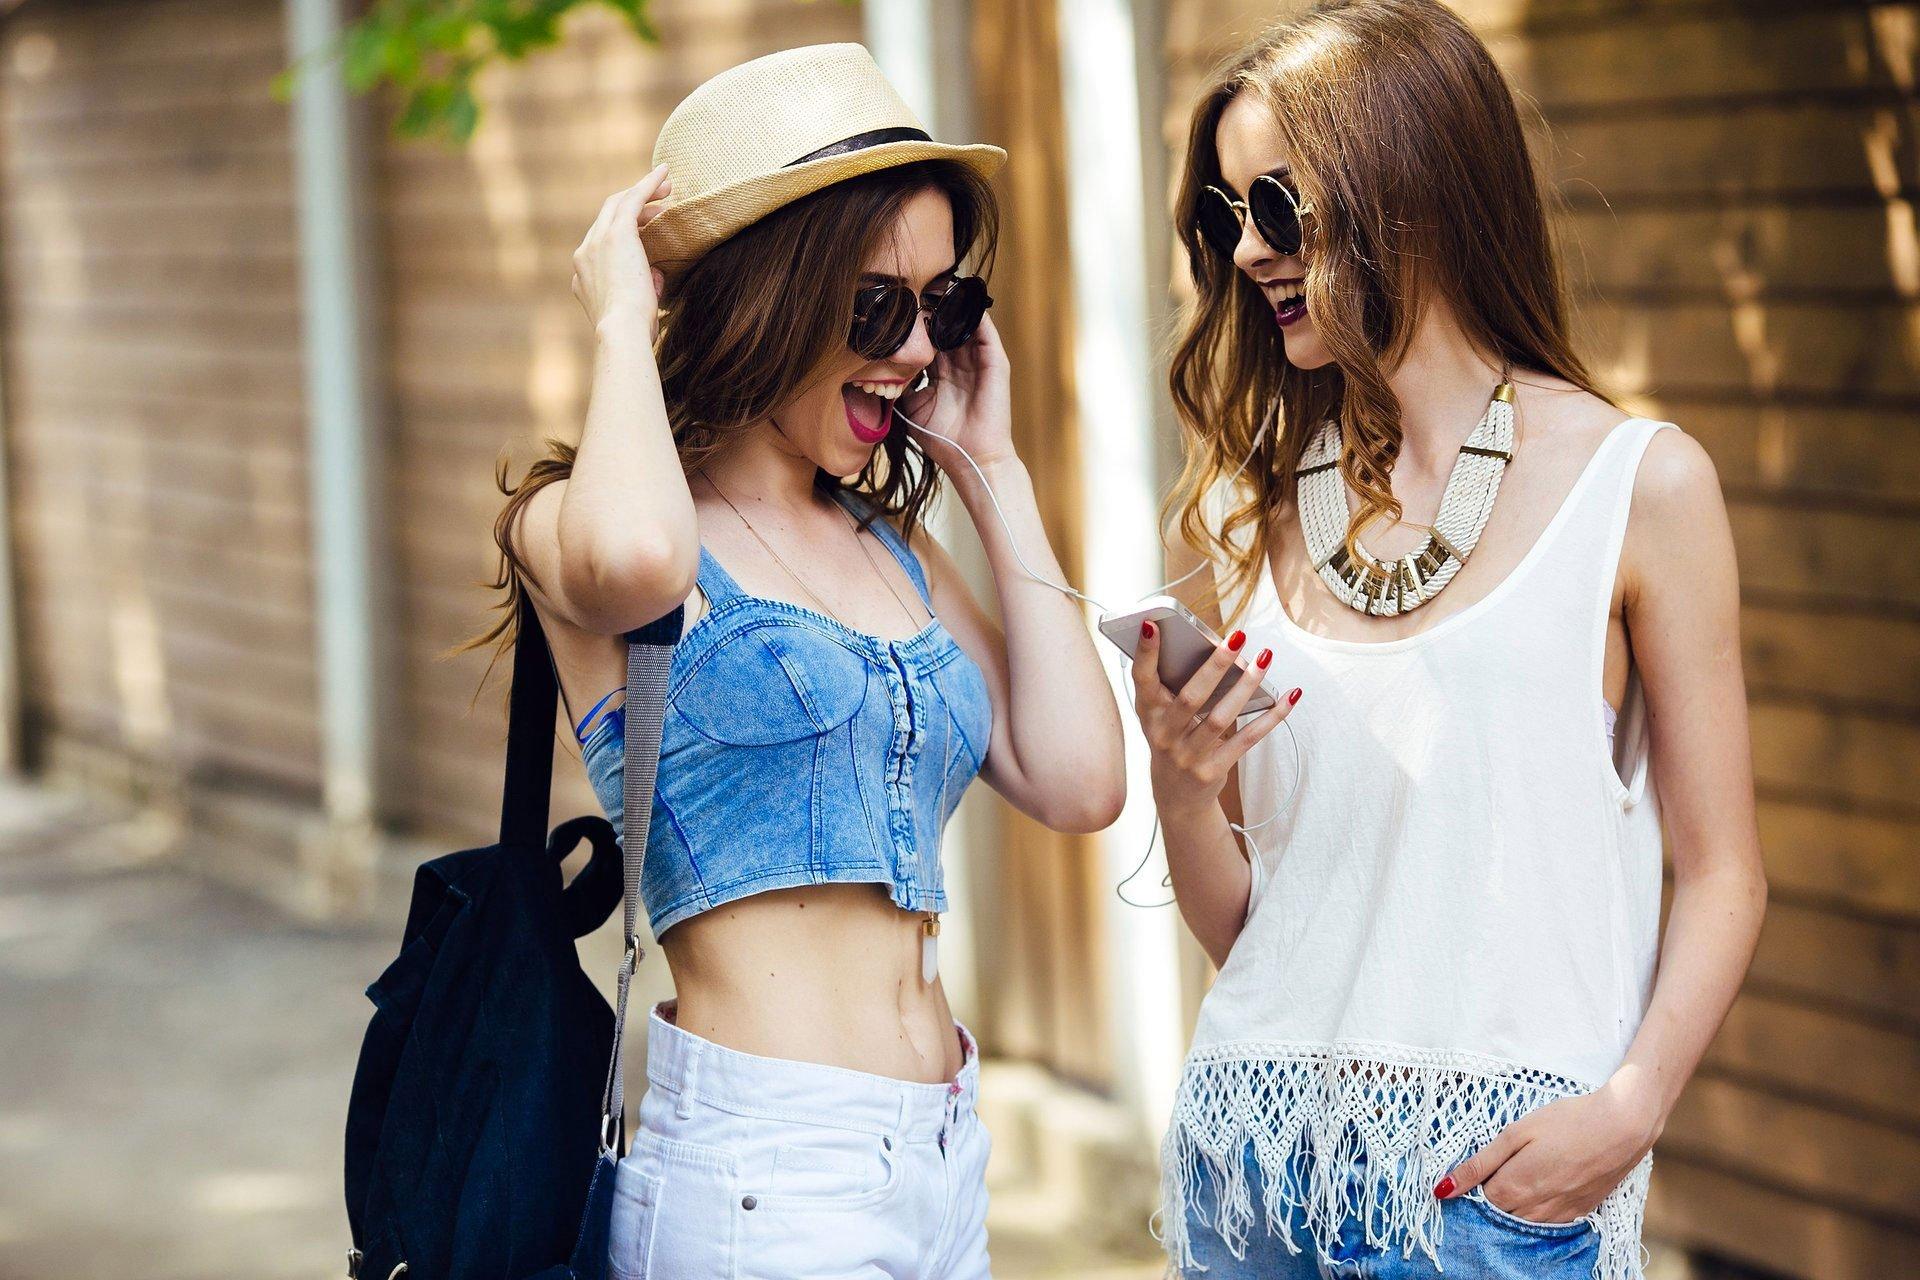 happy-teens-mobile